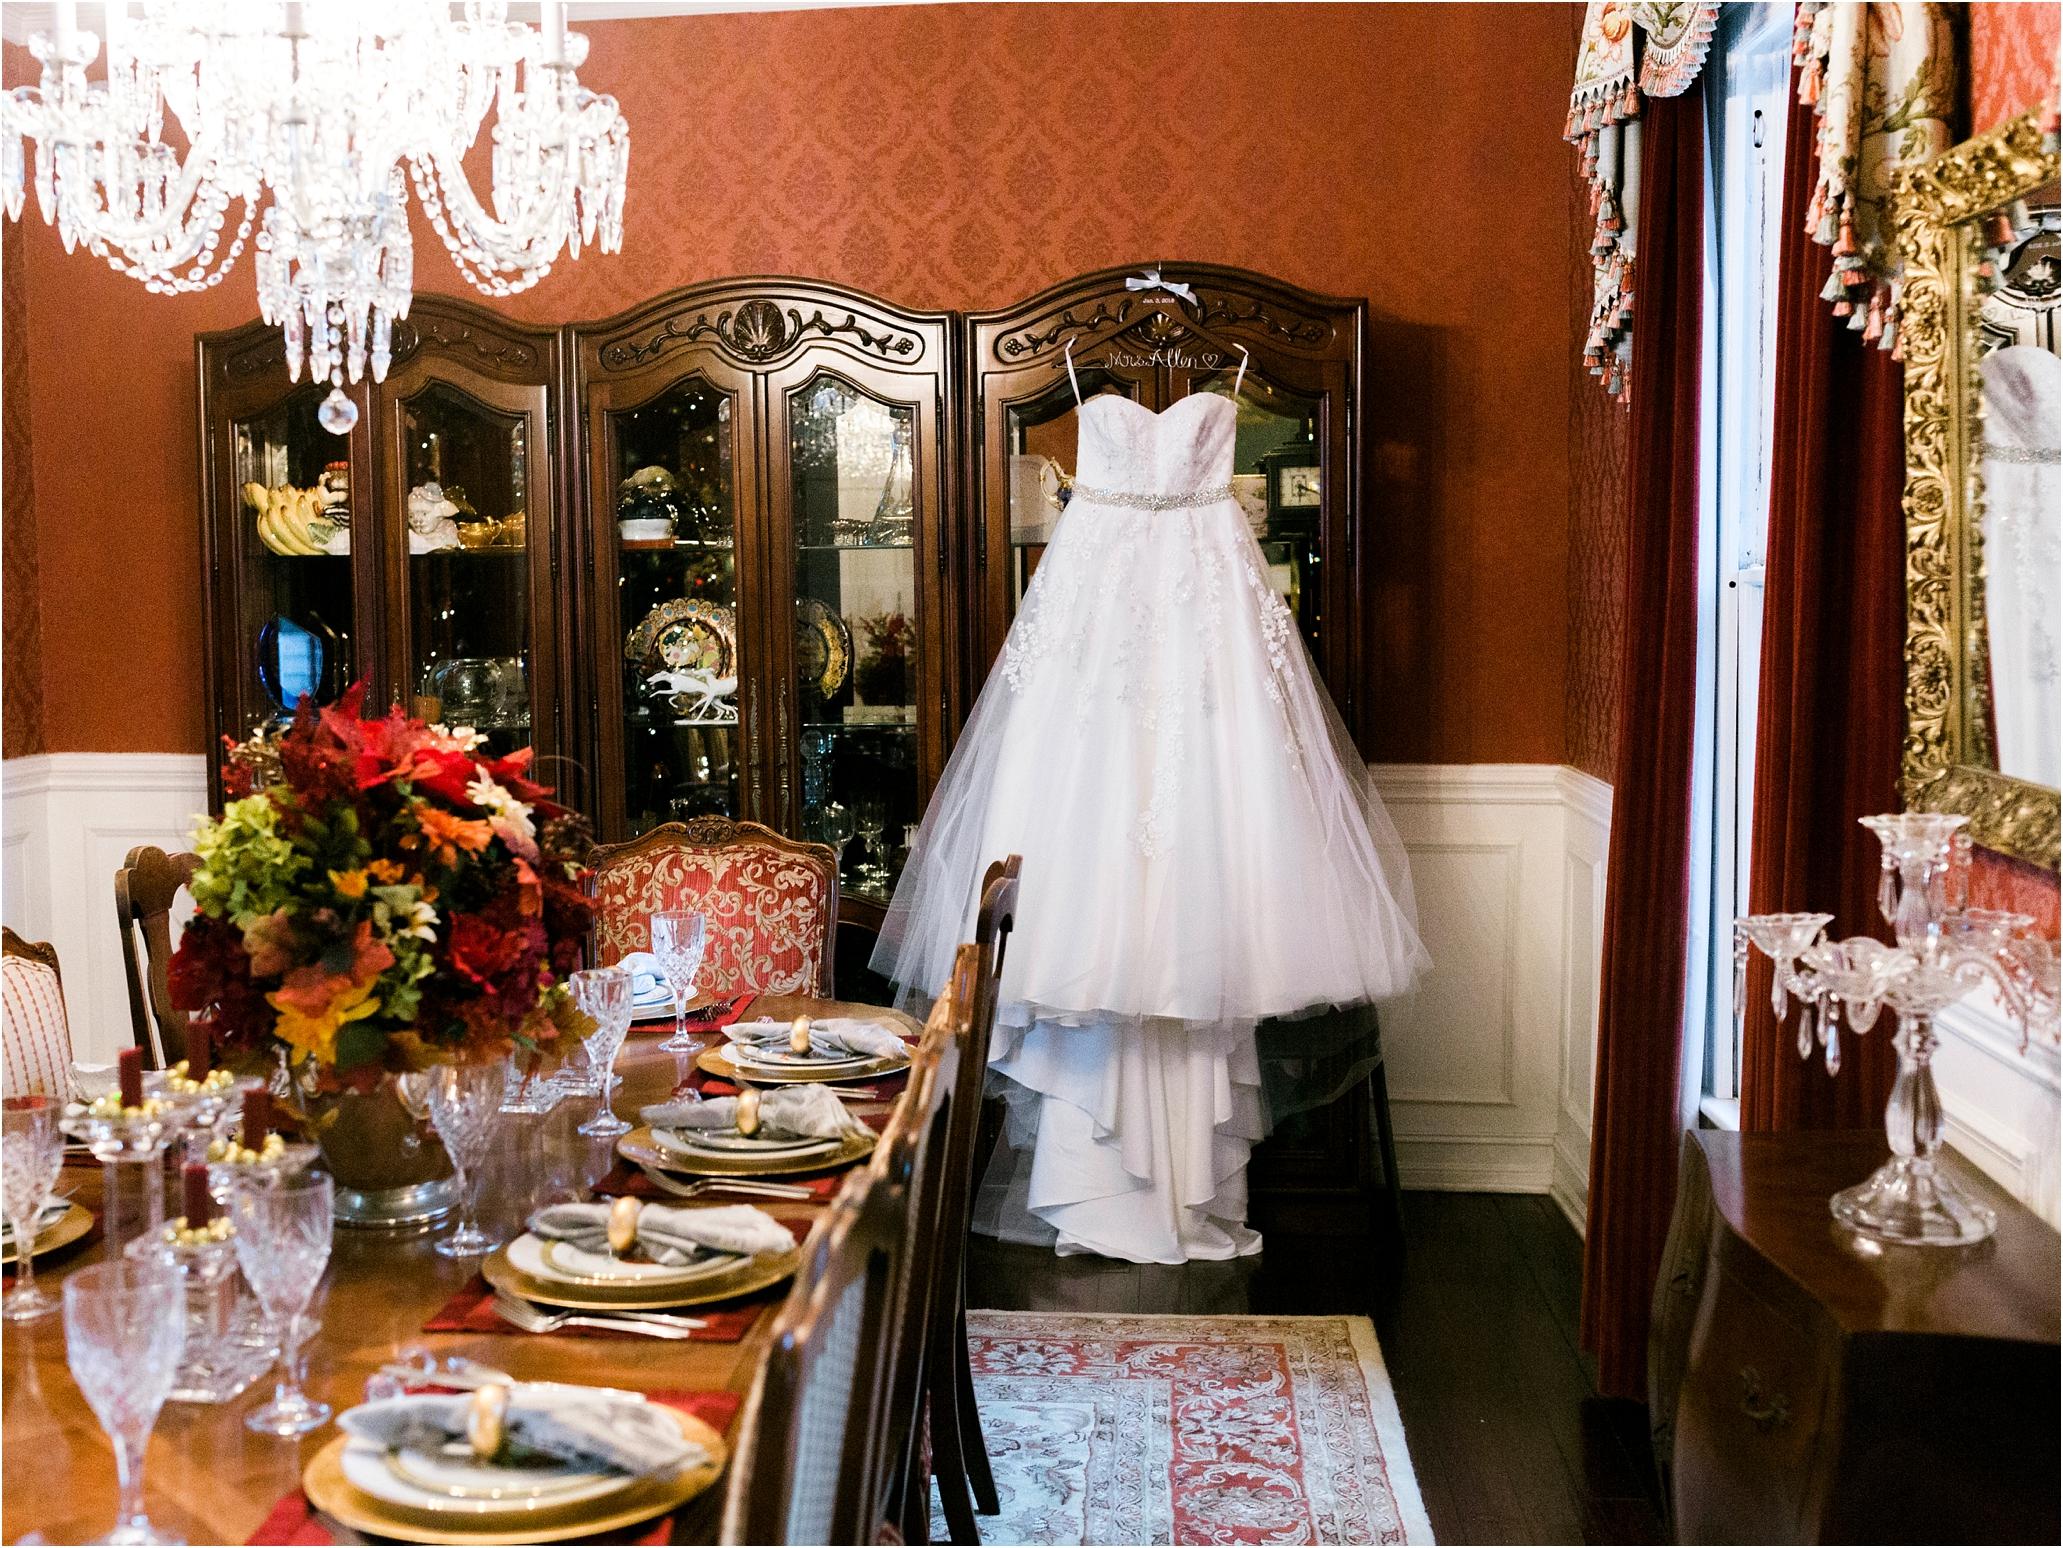 Lisa Silva Photography- Ponte Vedra Beach and Jacksonville, Florida Fine Art Film Wedding Photography- Wedding at The White Room Villa Blanca in St. Augustine, Florida_0005.jpg